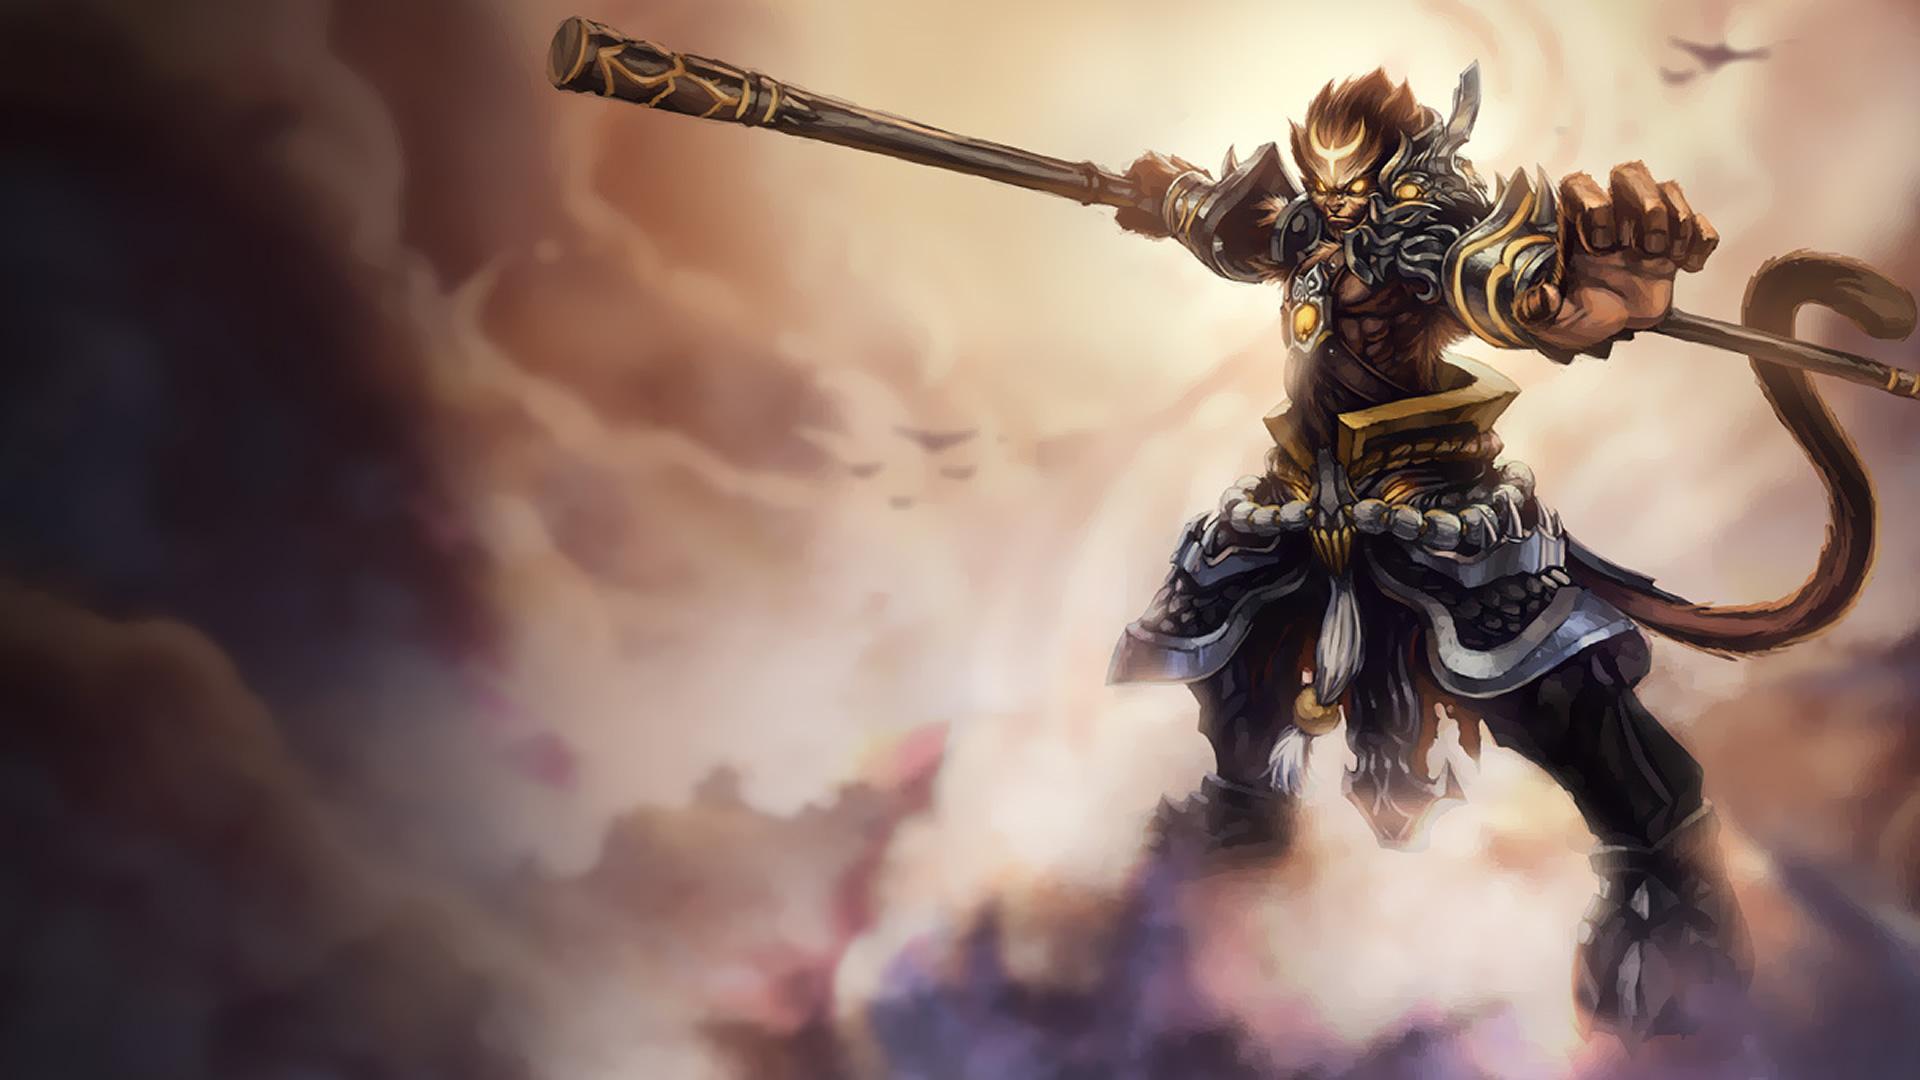 General Wukong wallpaper